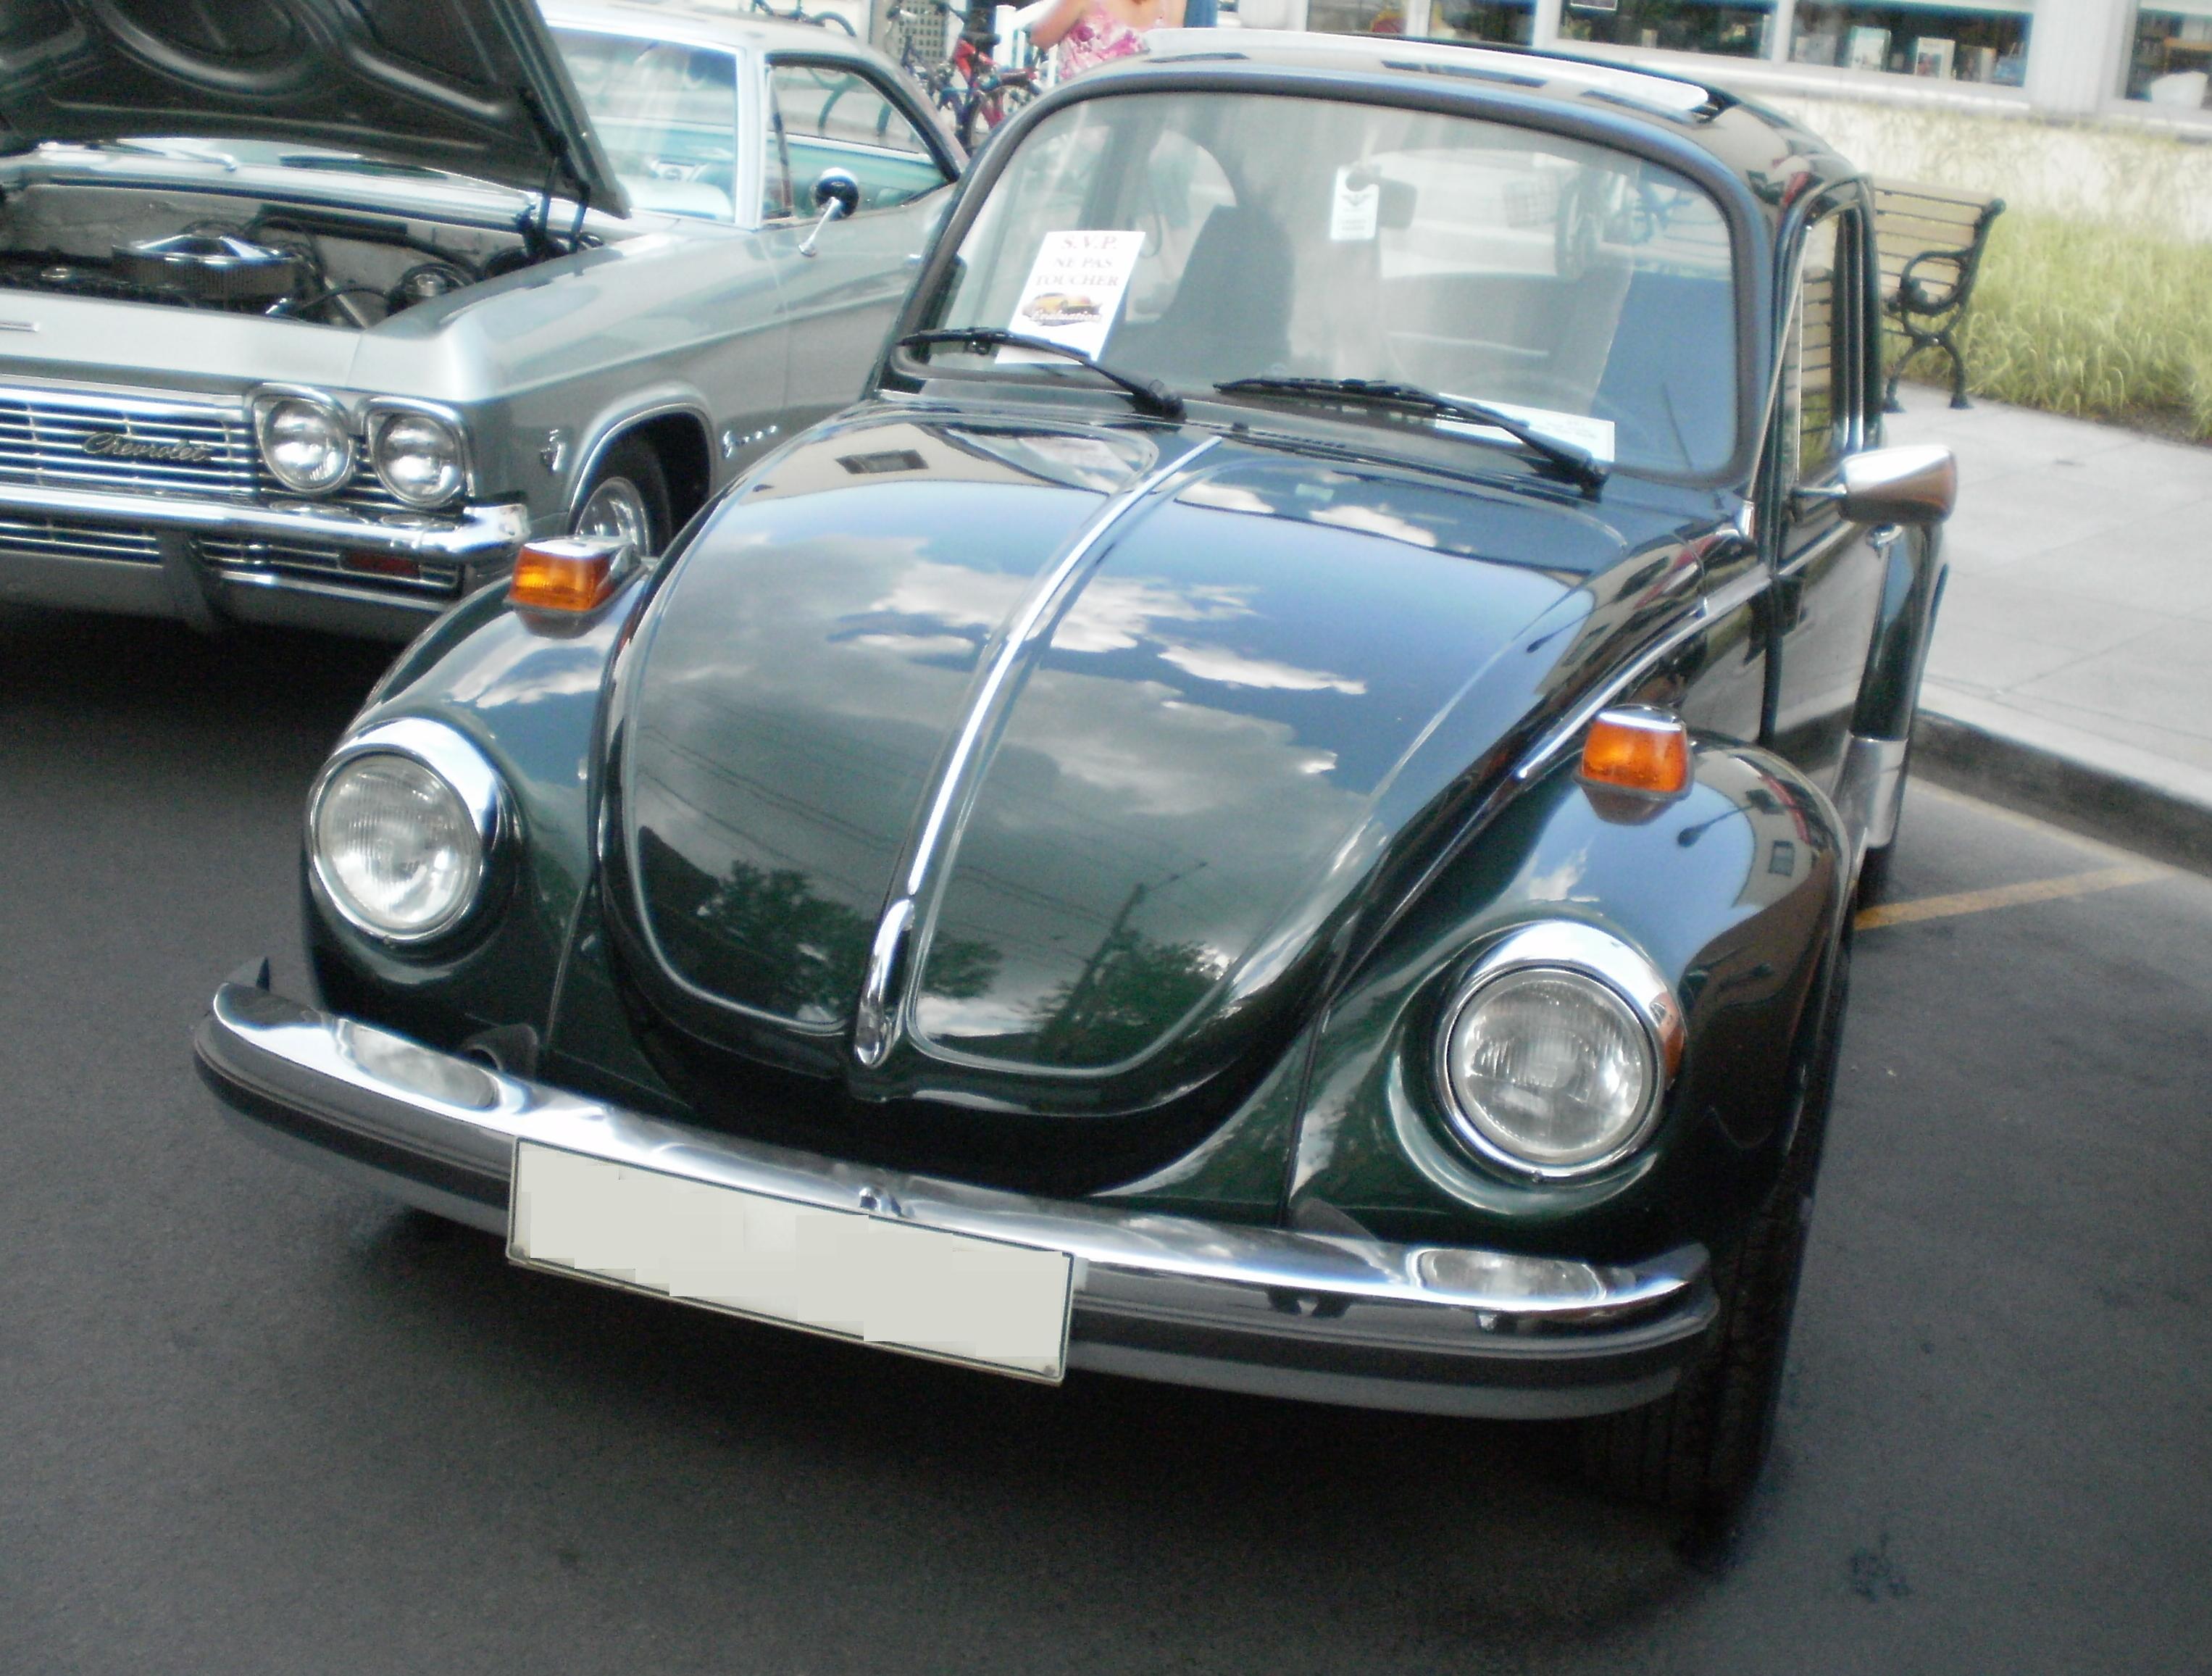 File:'74 Volkswagen Super Beetle (Cruisin' At The Boardwalk '11).jpg